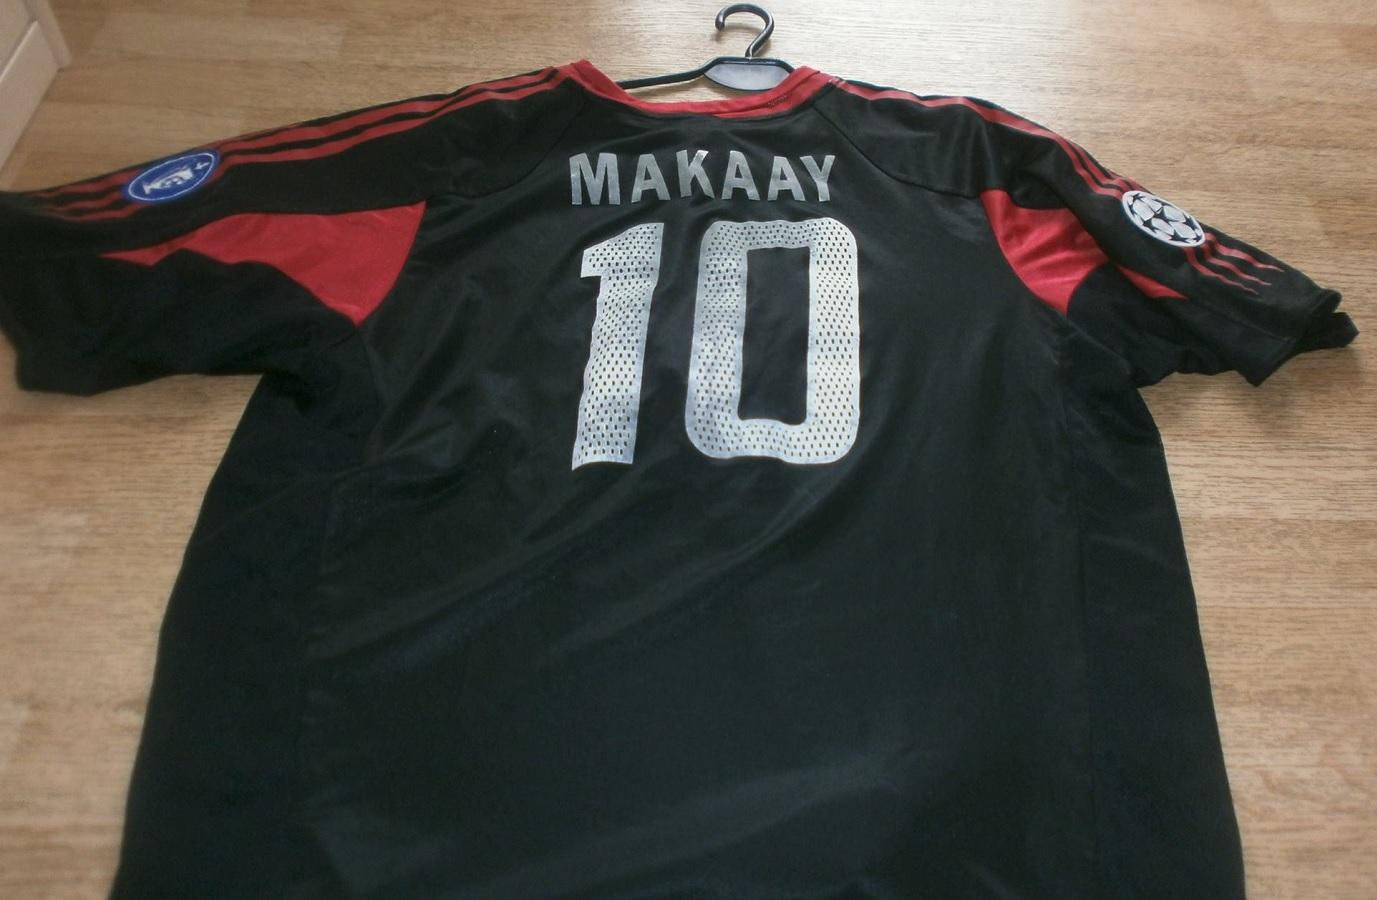 FC Bayern München Champions League 2004/05 Makaay